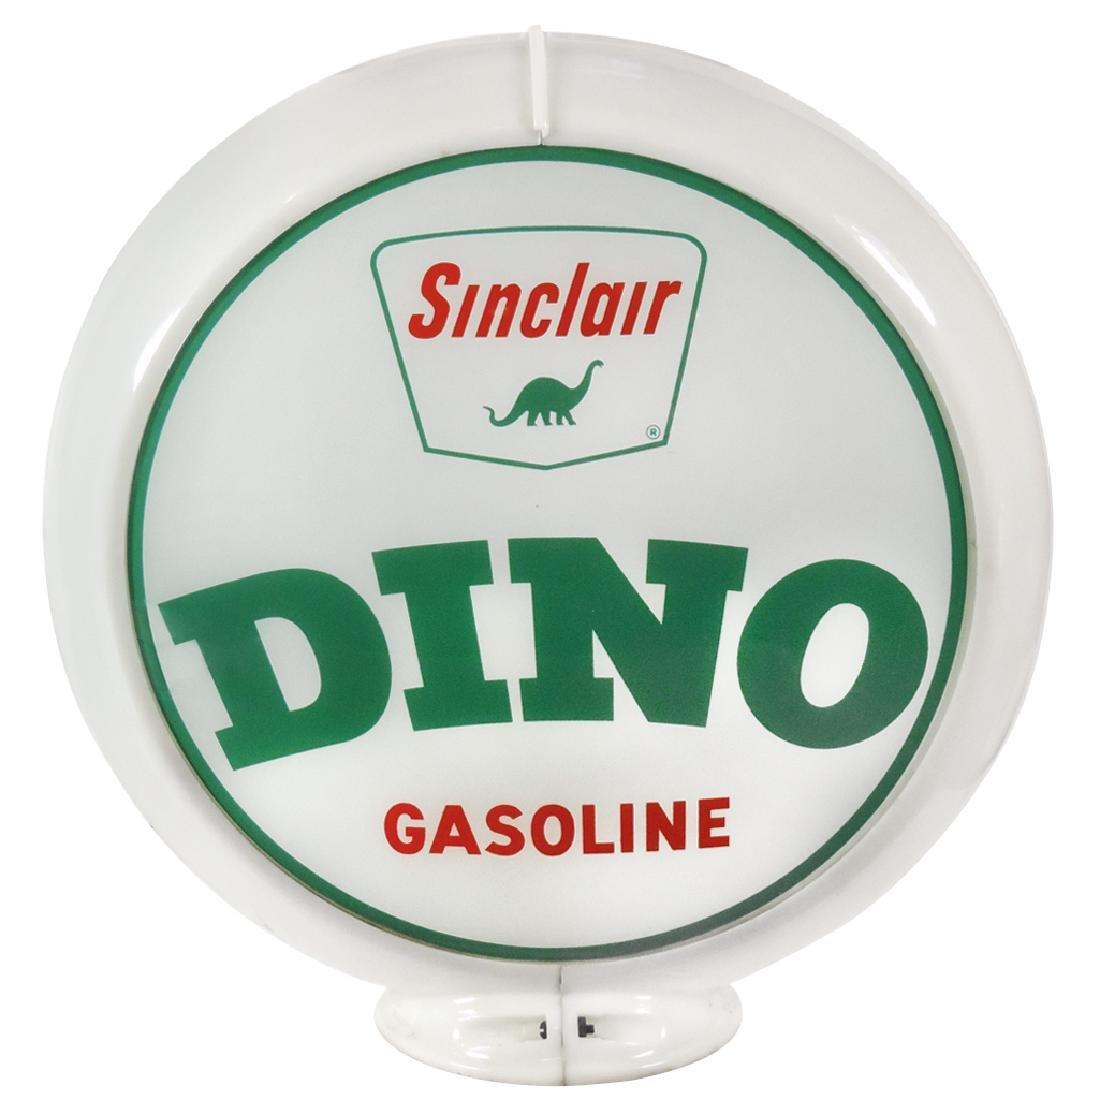 Gasoline Dino globe, Sinclair,  2 curved glass lenses